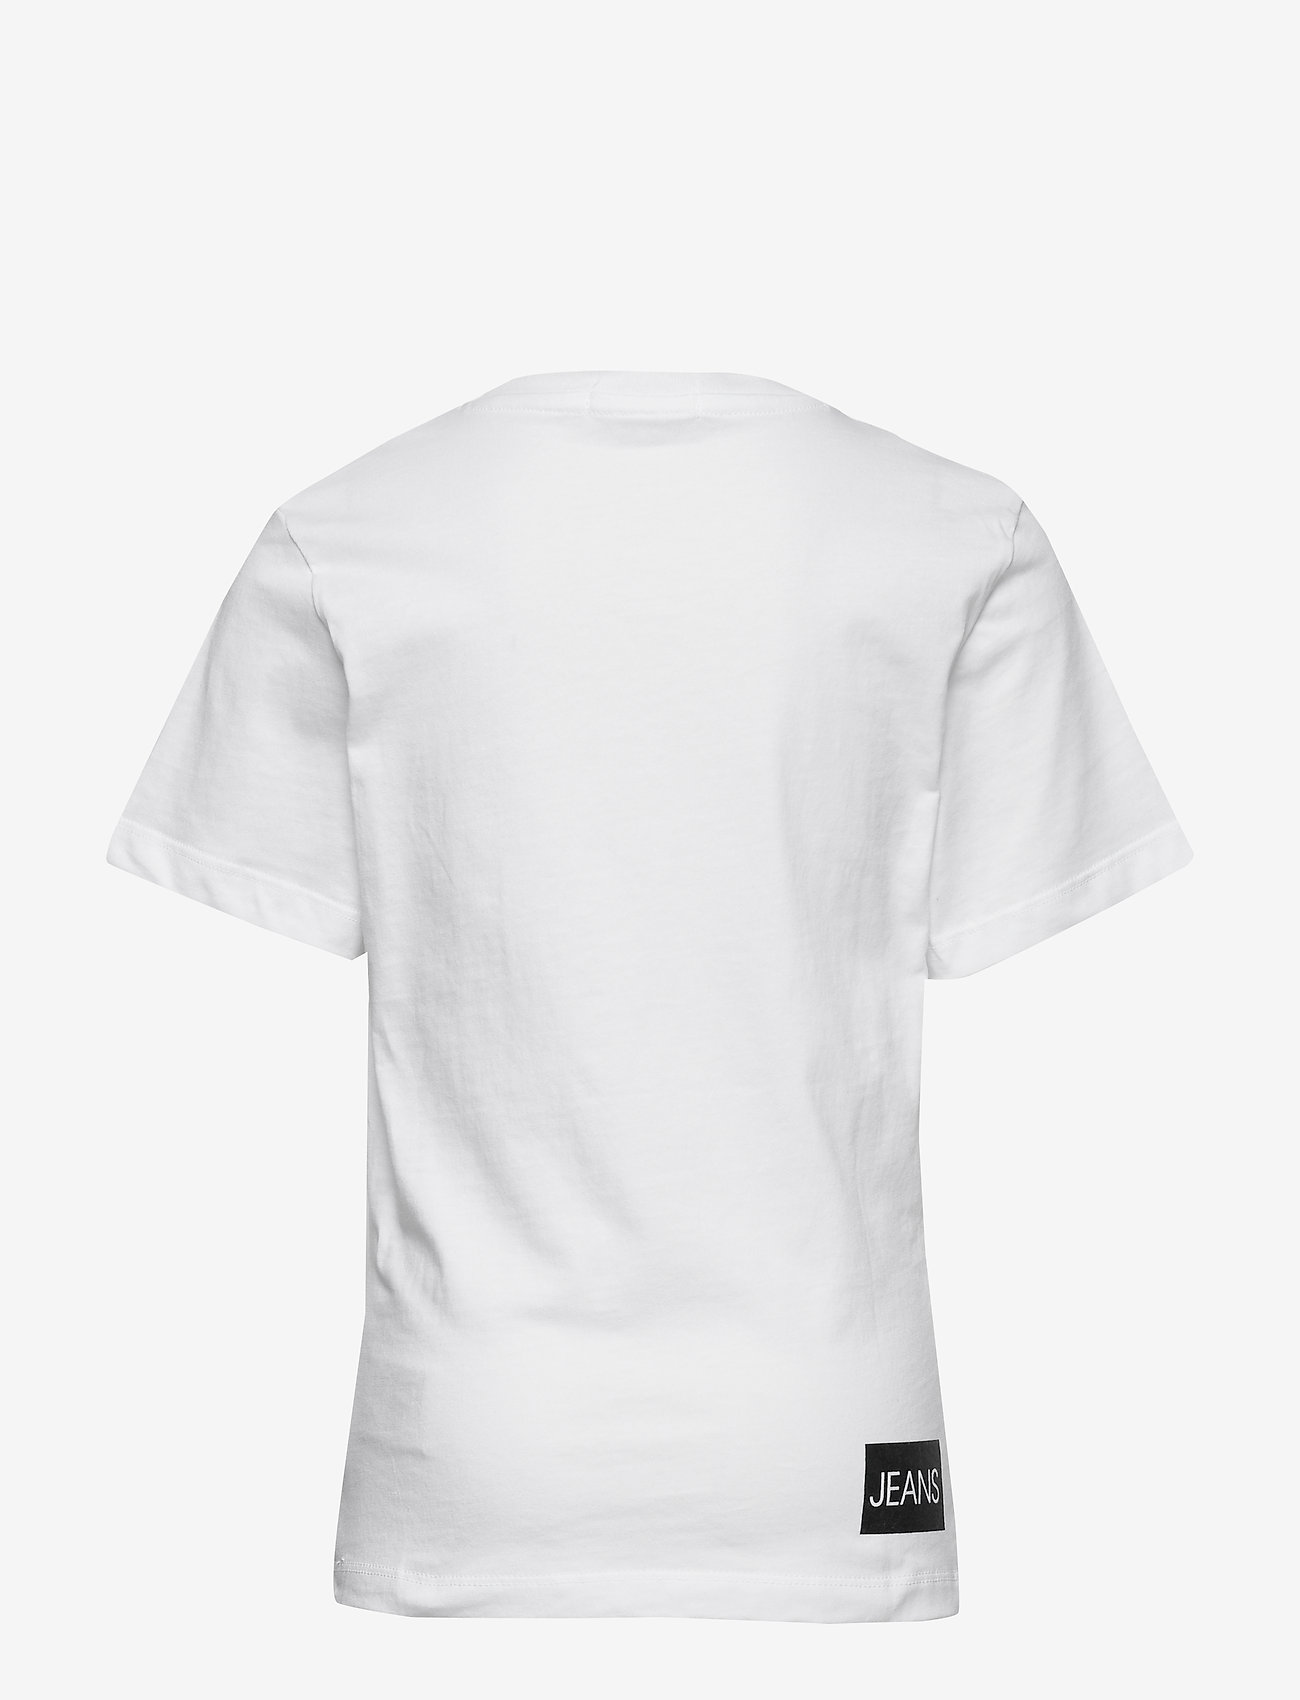 Calvin Klein - INSTITUTIONAL SS T-SHIRT - t-shirts - bright white - 1